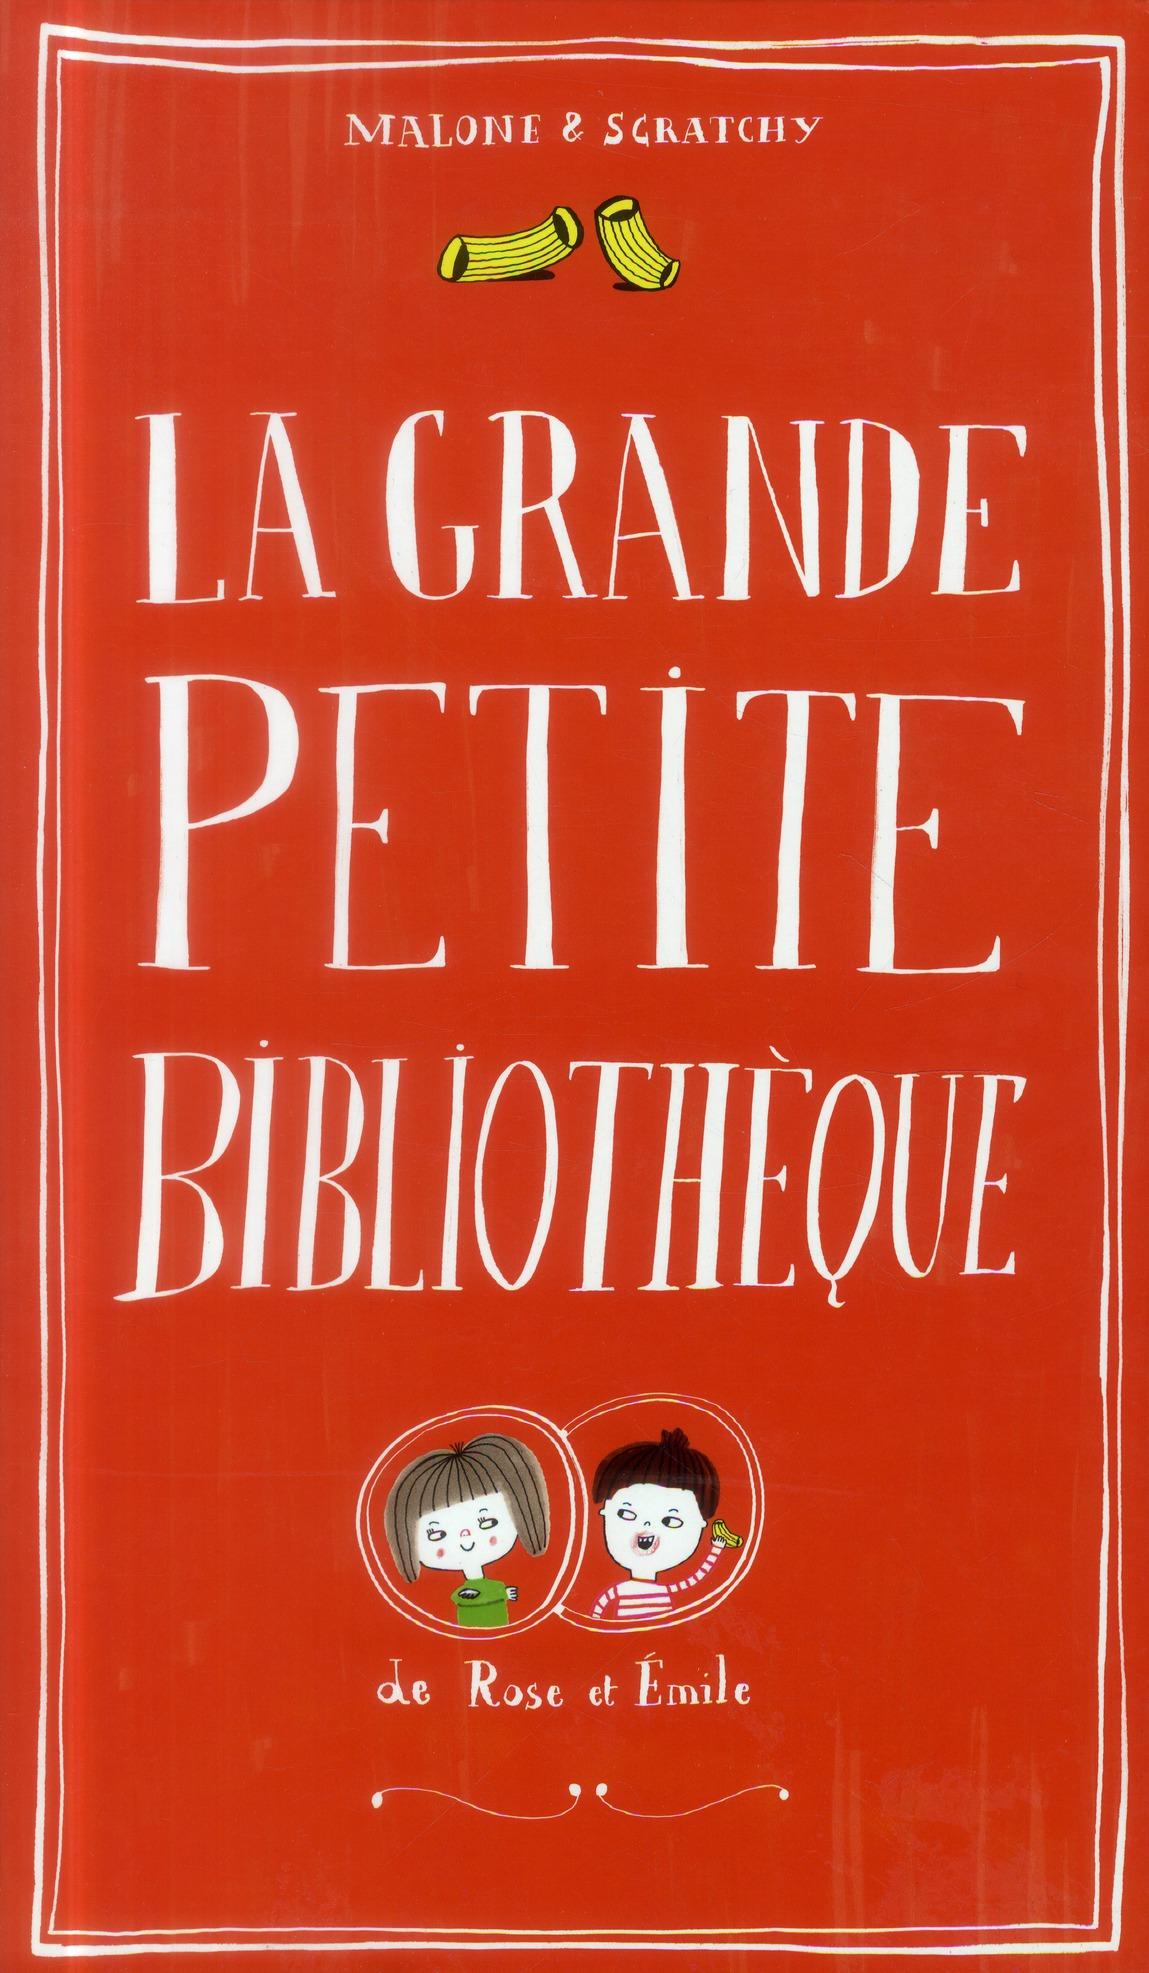 LA GRANDE PETITE BIBLIOTHEQUE DE ROSE ET EMILE